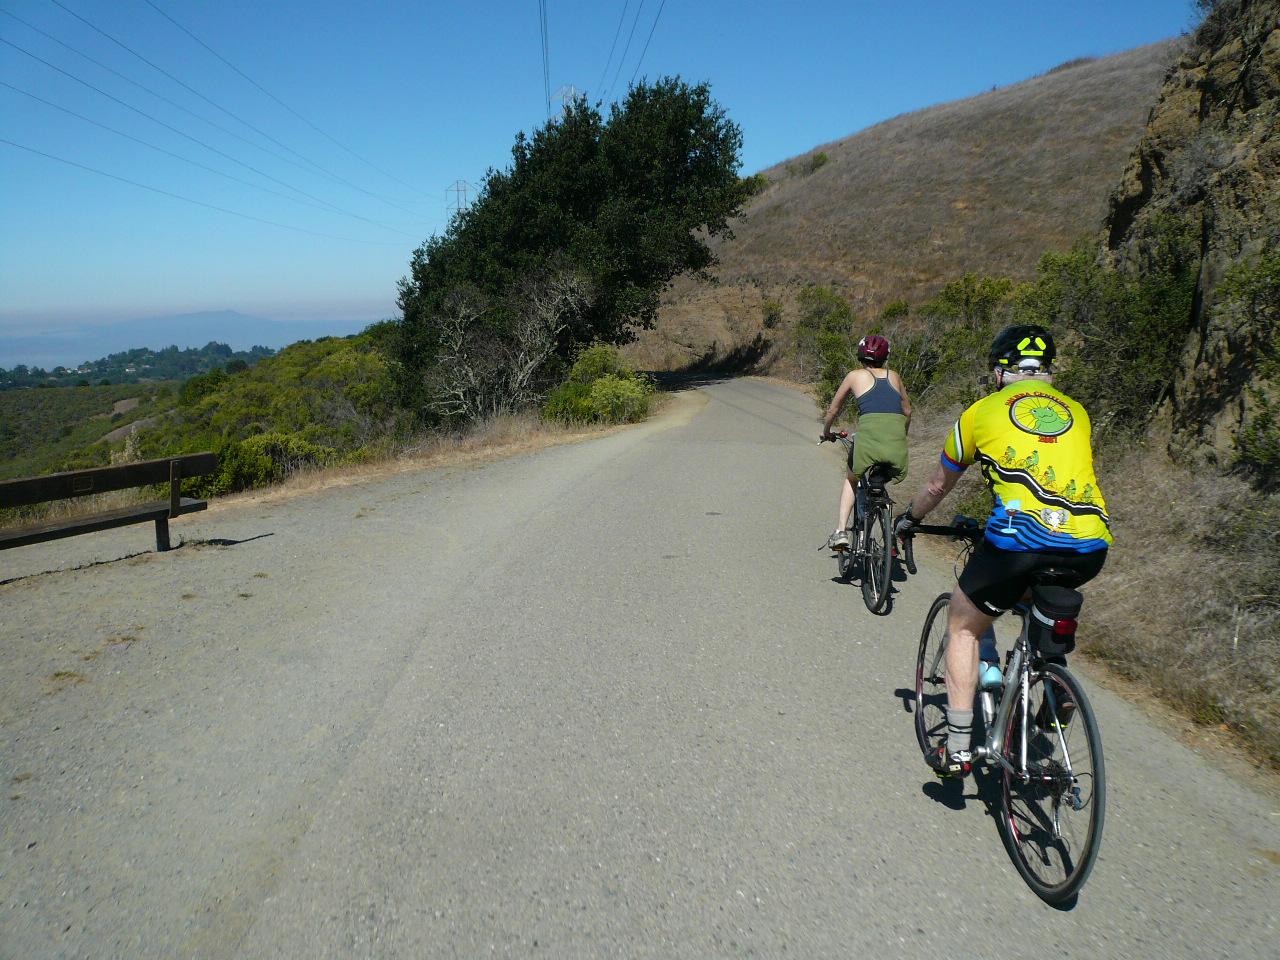 Biking in Berkeley, CA